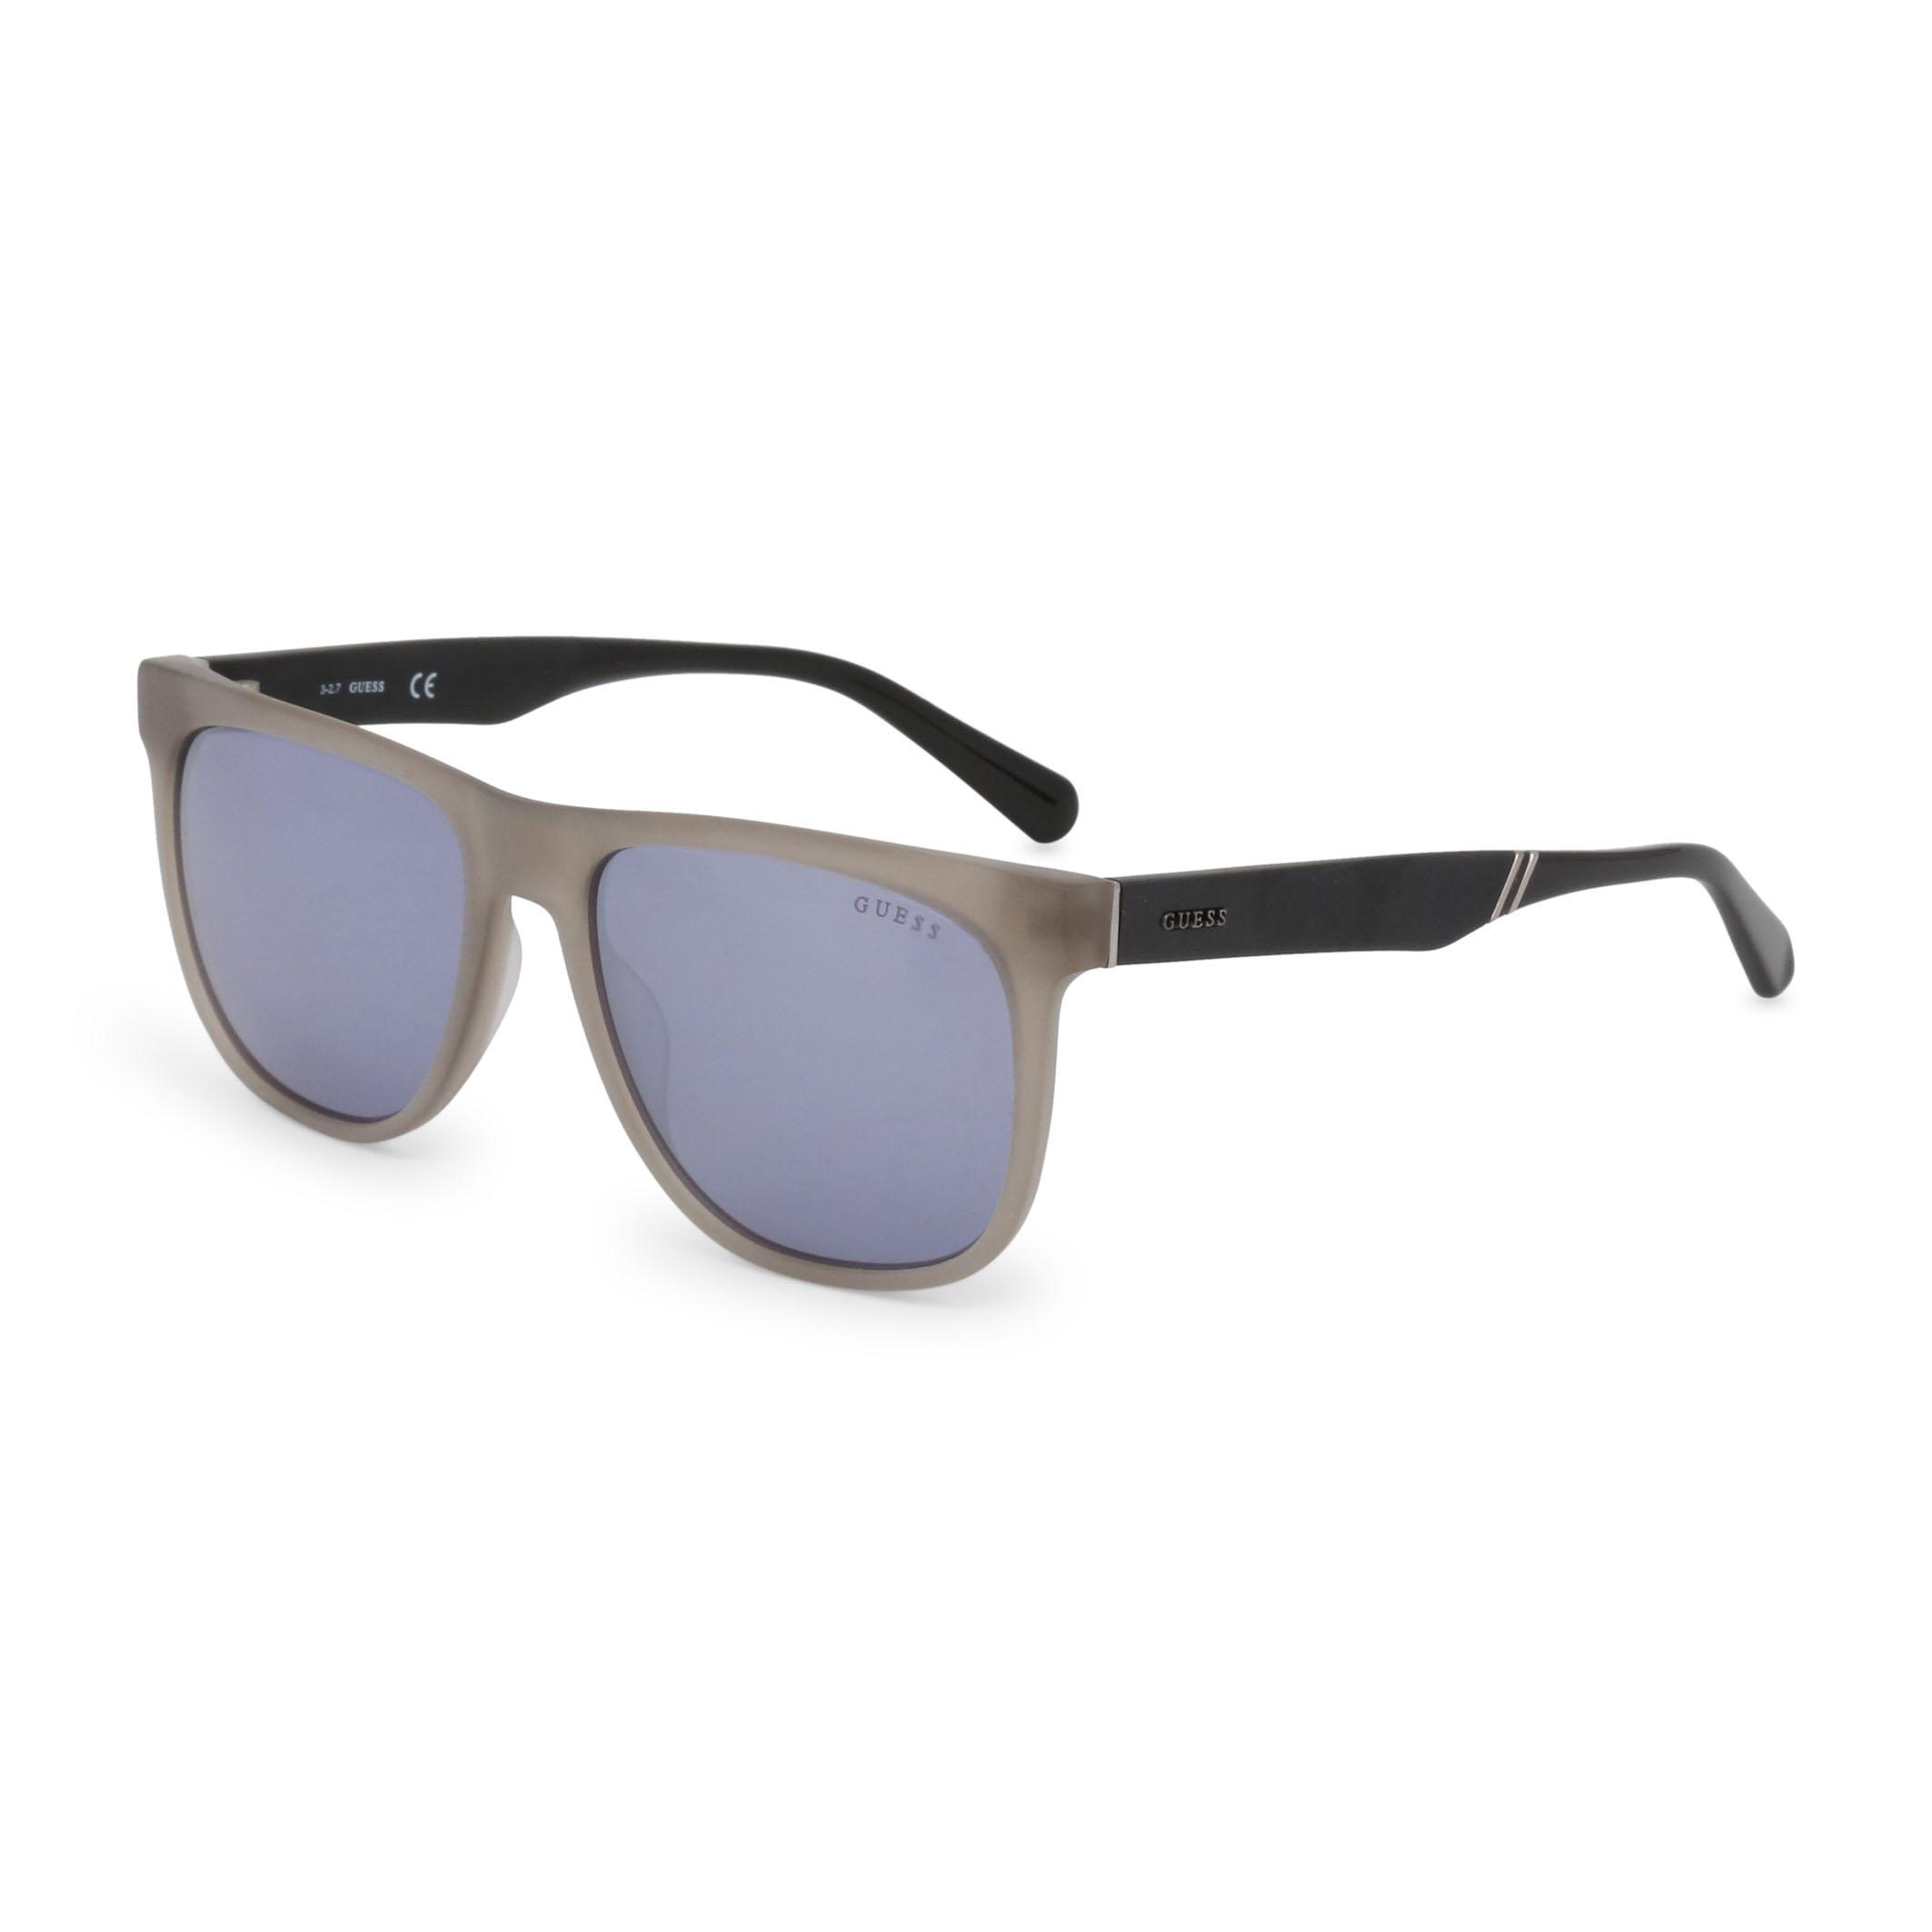 Guess-Unisex-Accessoires-moderne-Designer-Sonnenbrille-Sonnenbrillen-Grau-Sungla